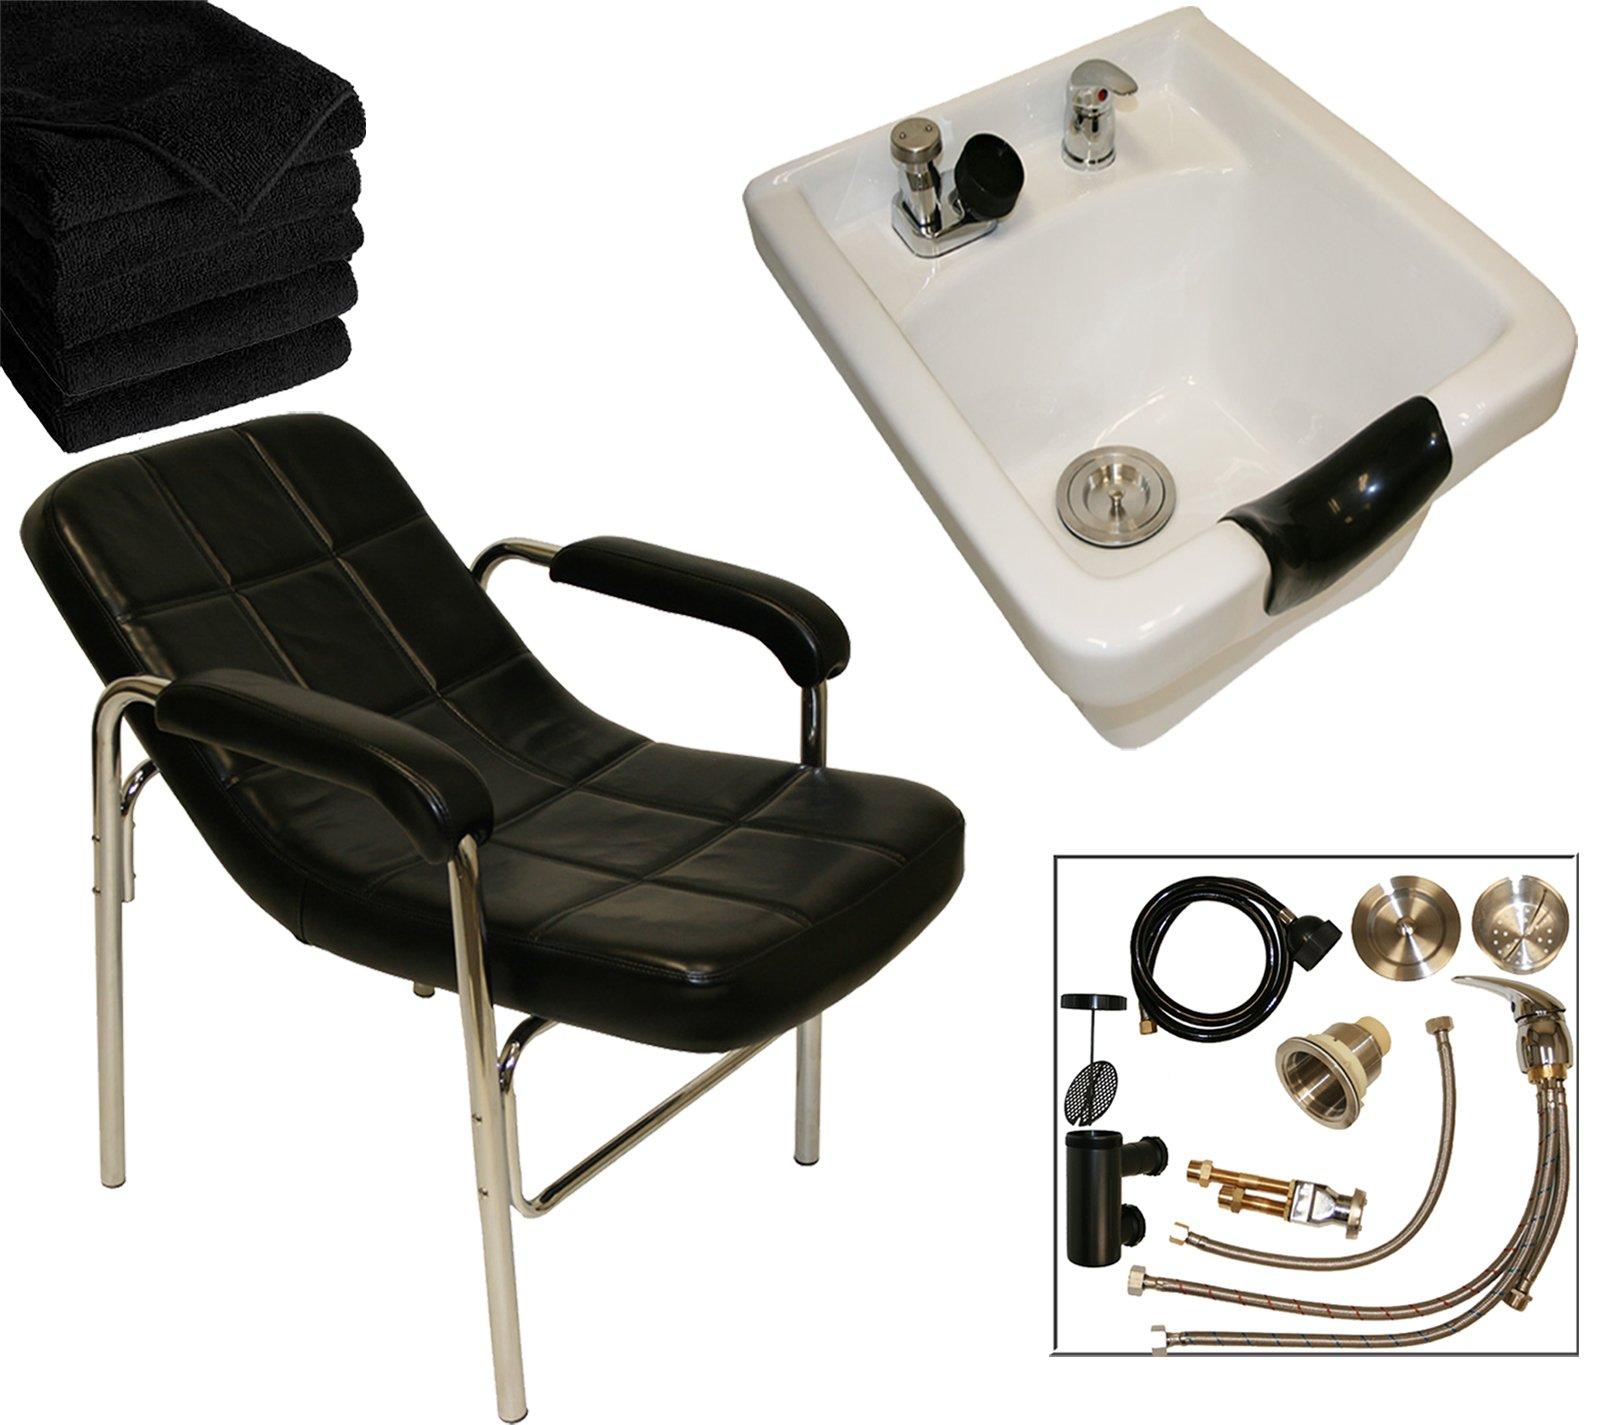 LCL Beauty Shampoo Package: Comfort-Curve Contemporary Slingback Shampoo Chair & White Ceramic Shampoo Bowl